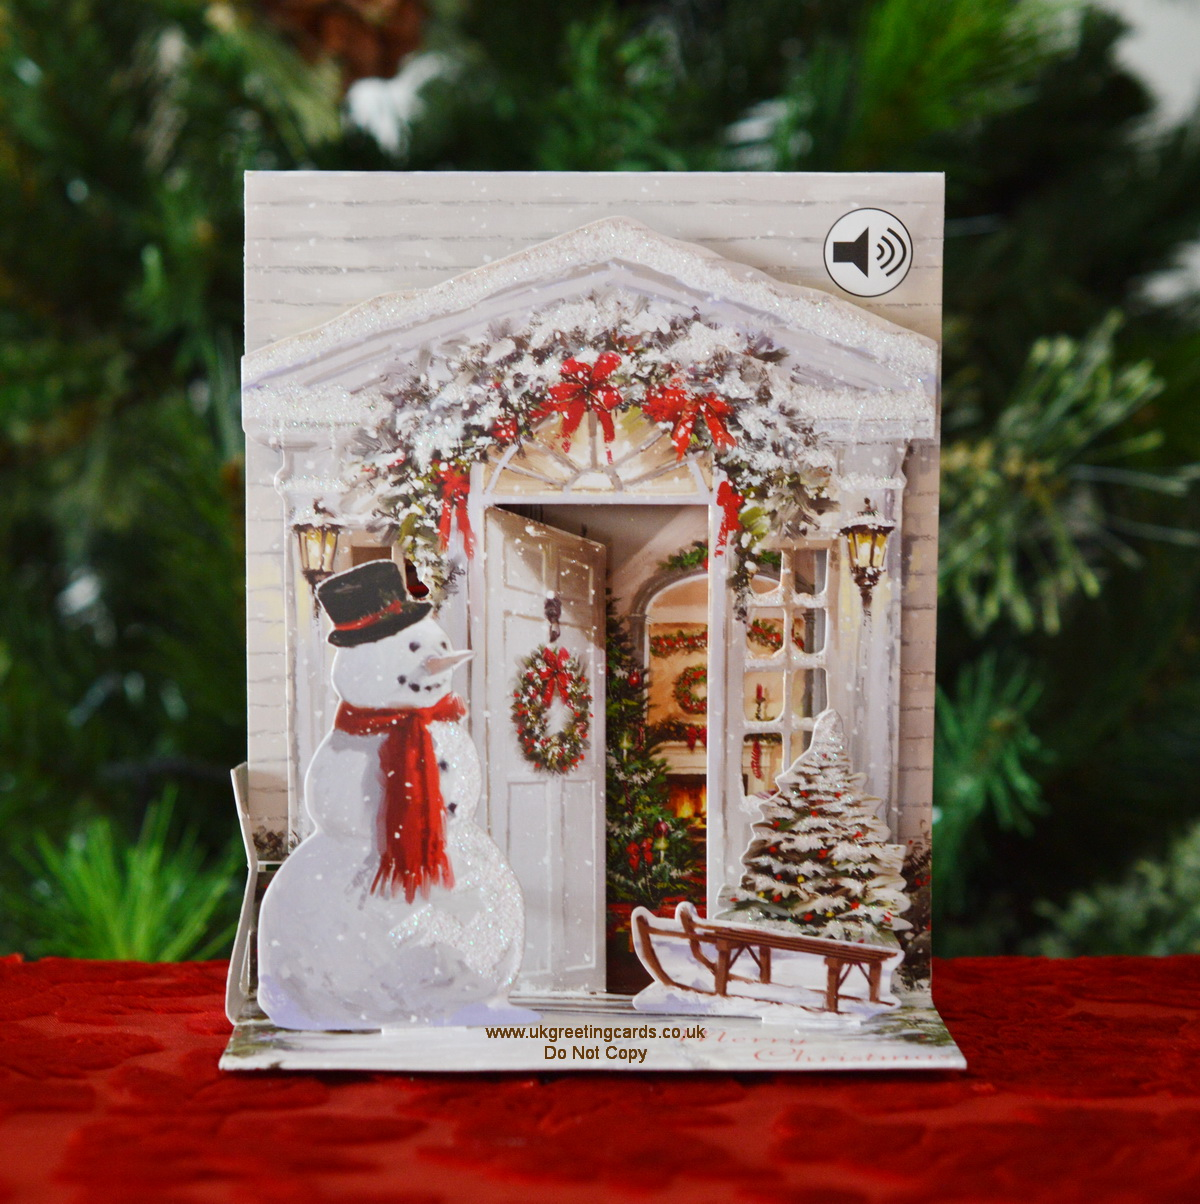 Handmade Greeting Cards Blog: Handmade Christmas Cards